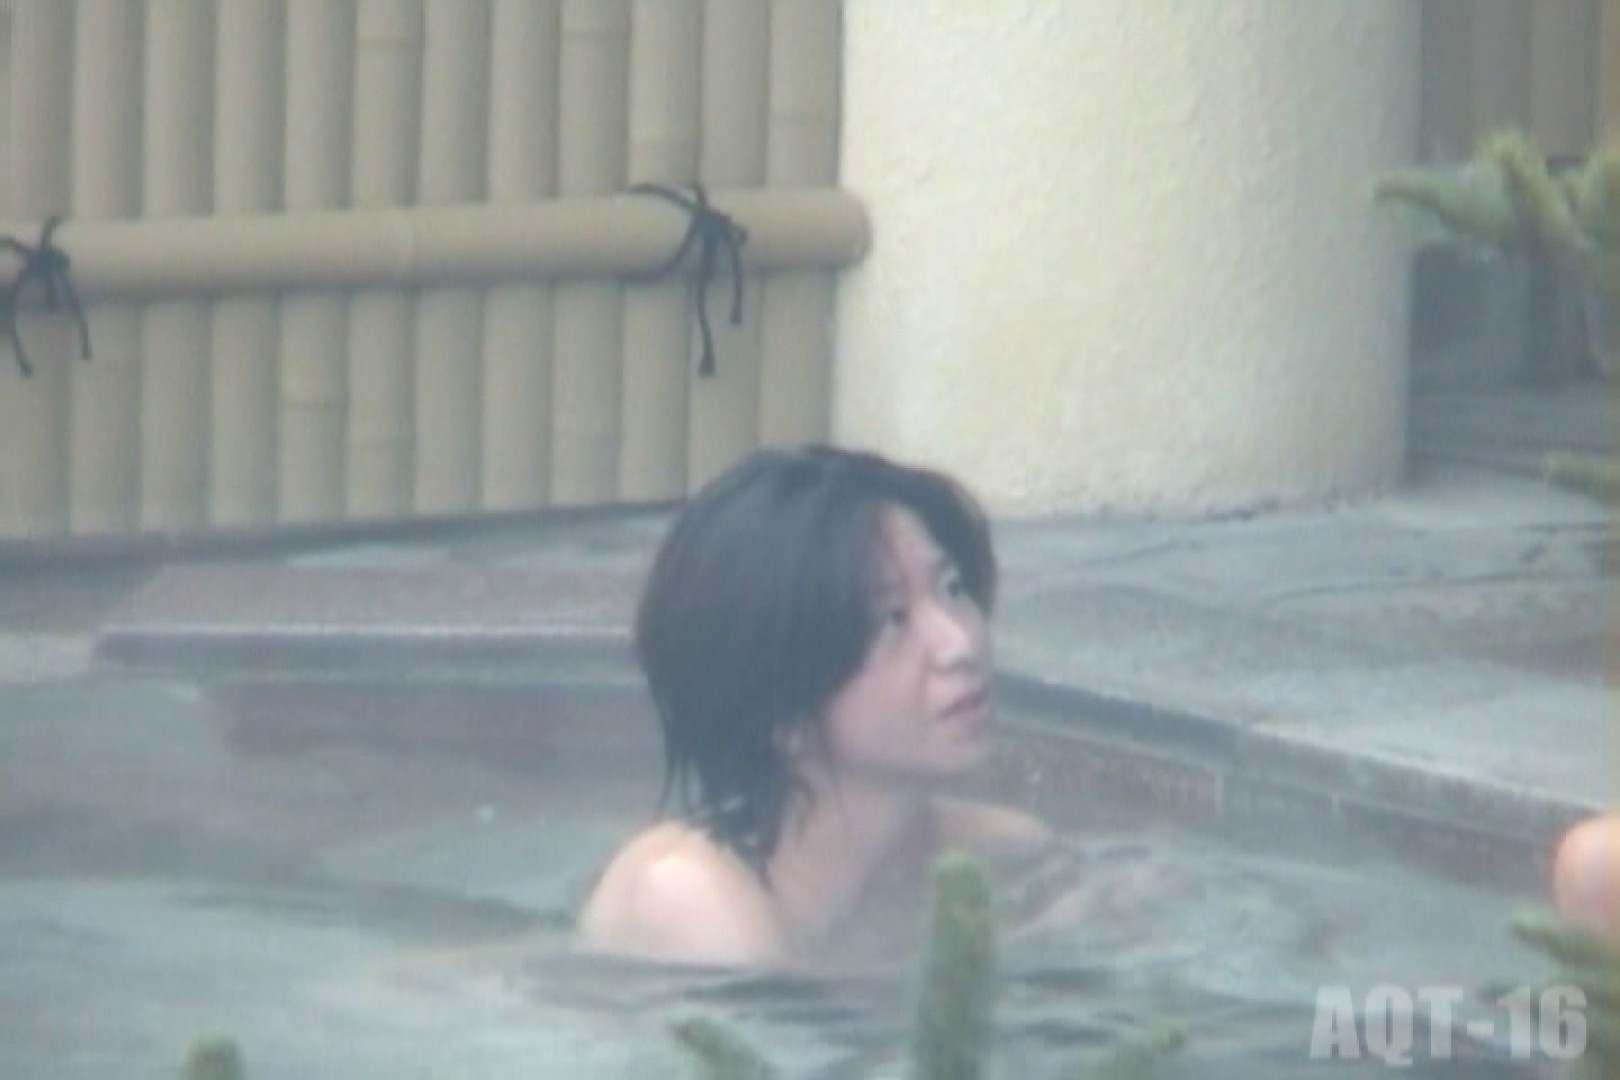 Aquaな露天風呂Vol.841 盗撮師作品 ワレメ動画紹介 77pic 59